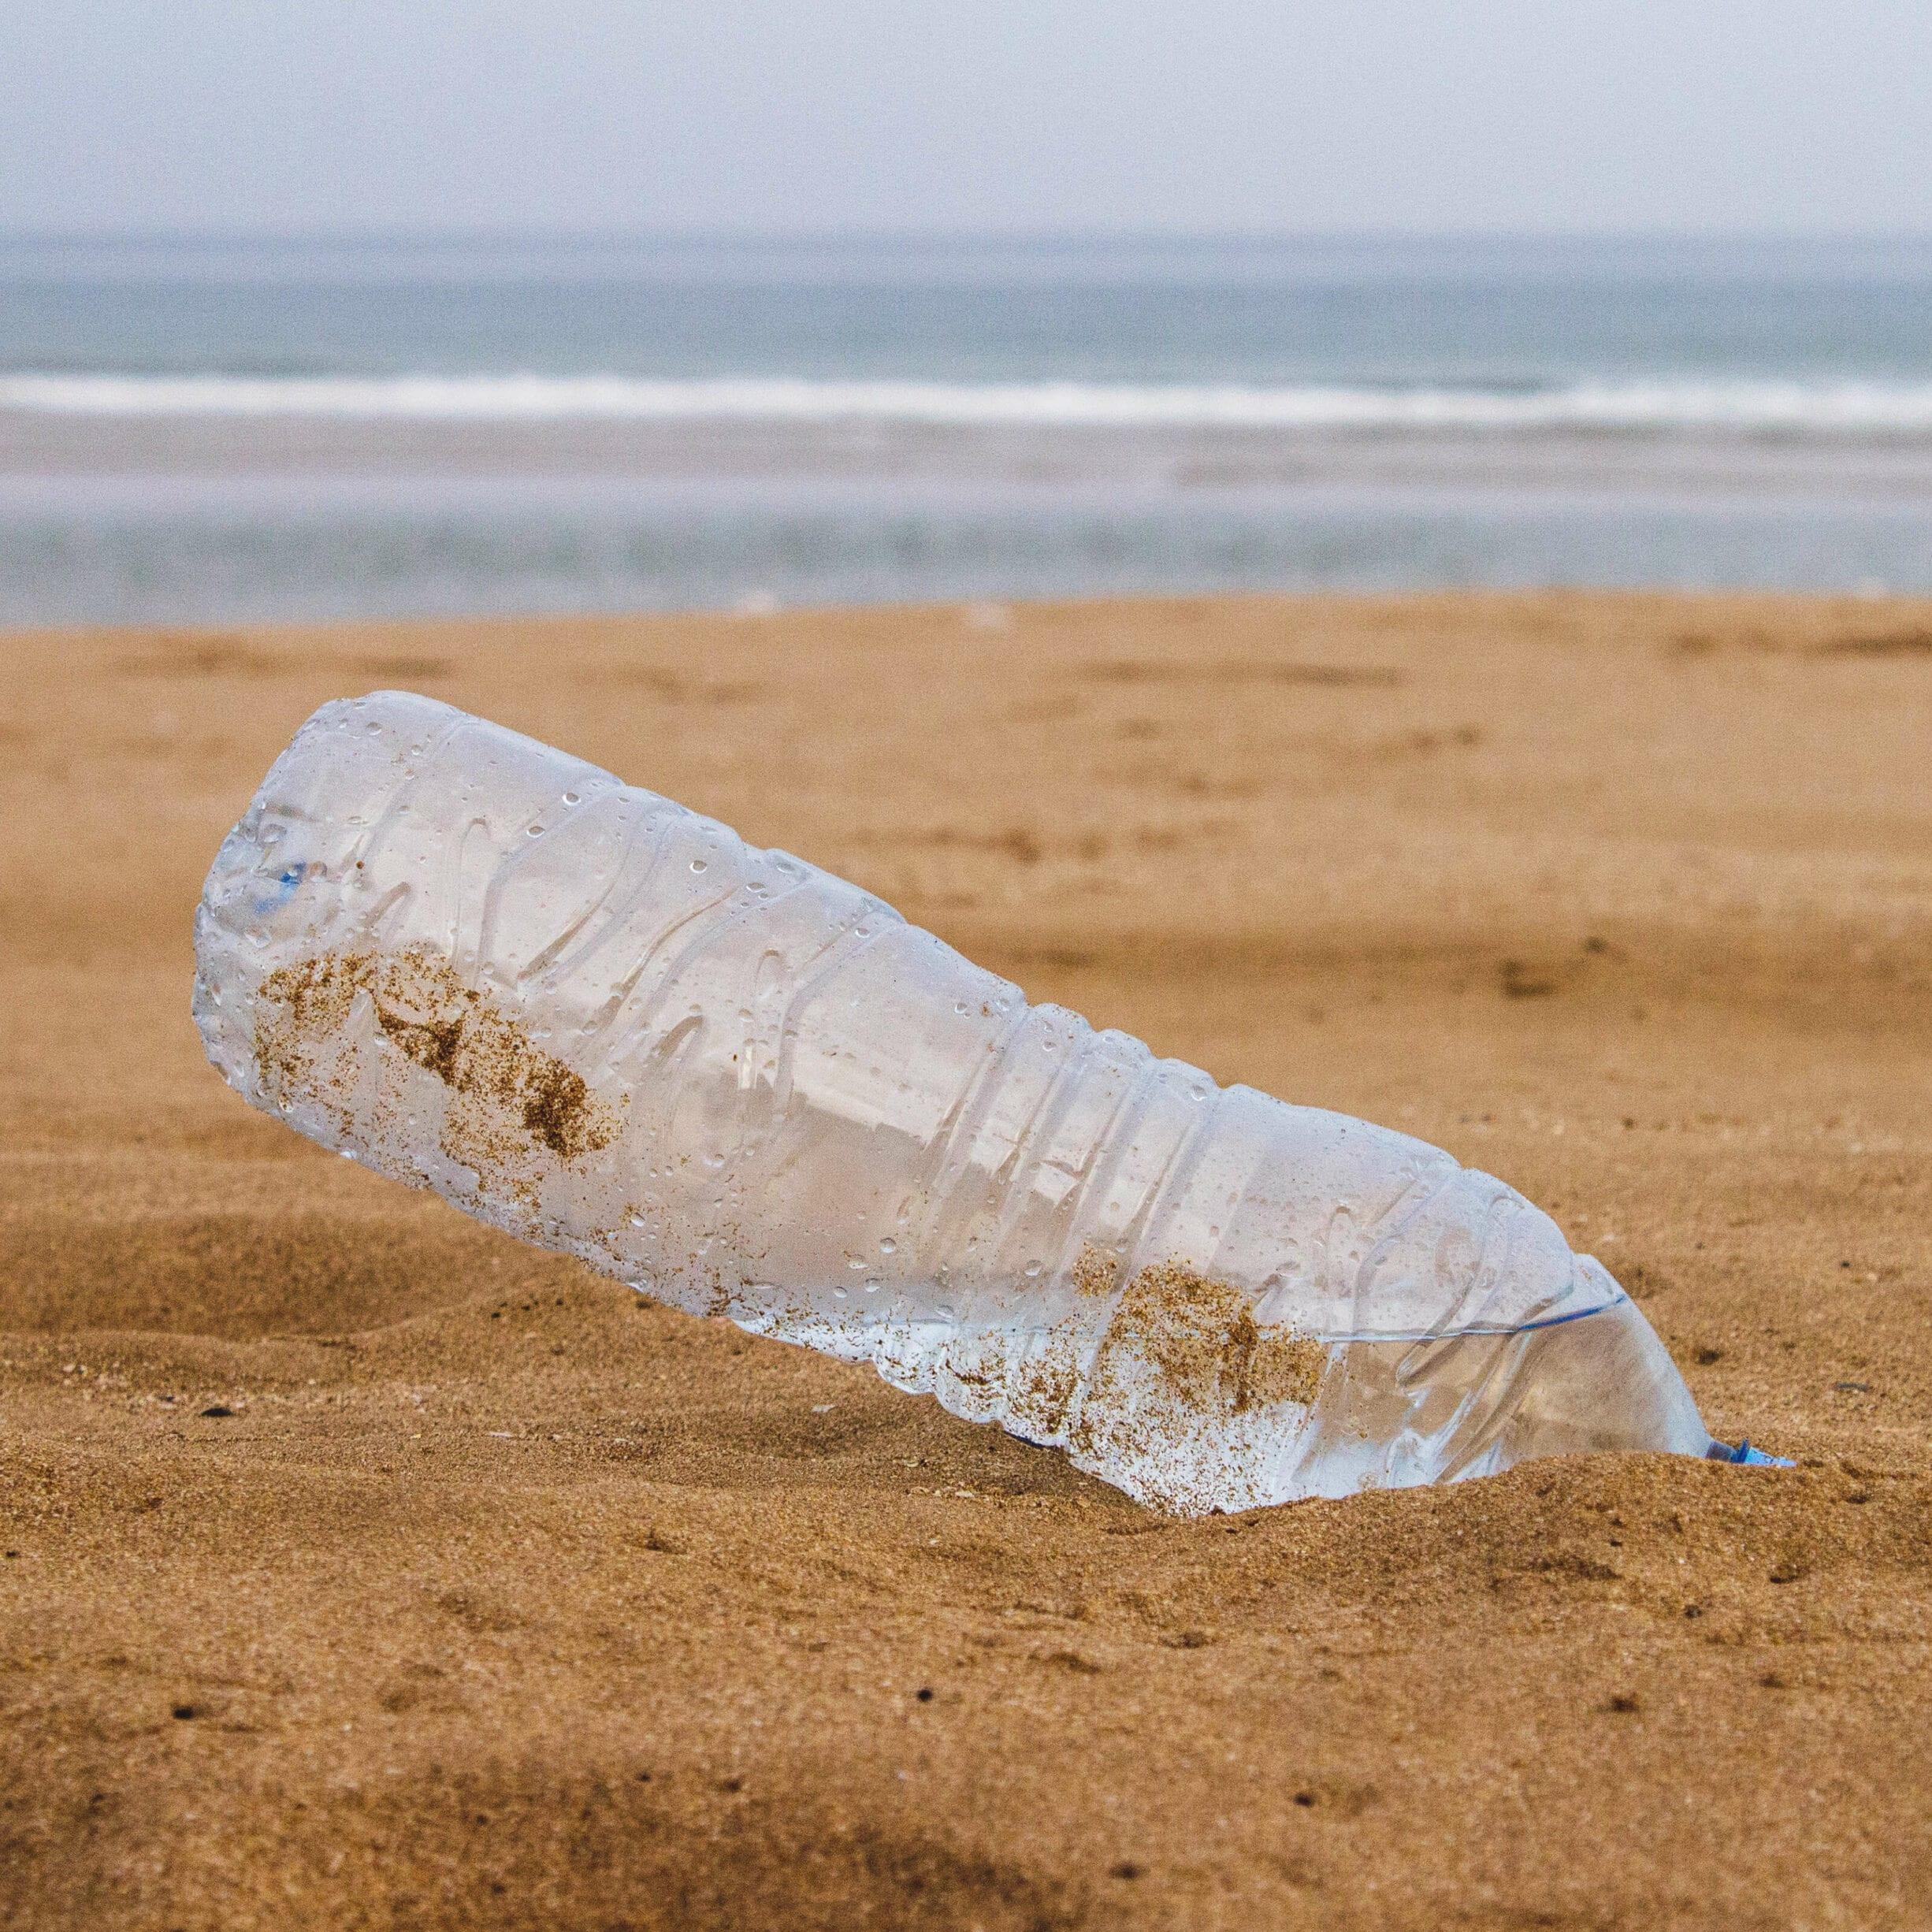 plastic bottle in beach sand